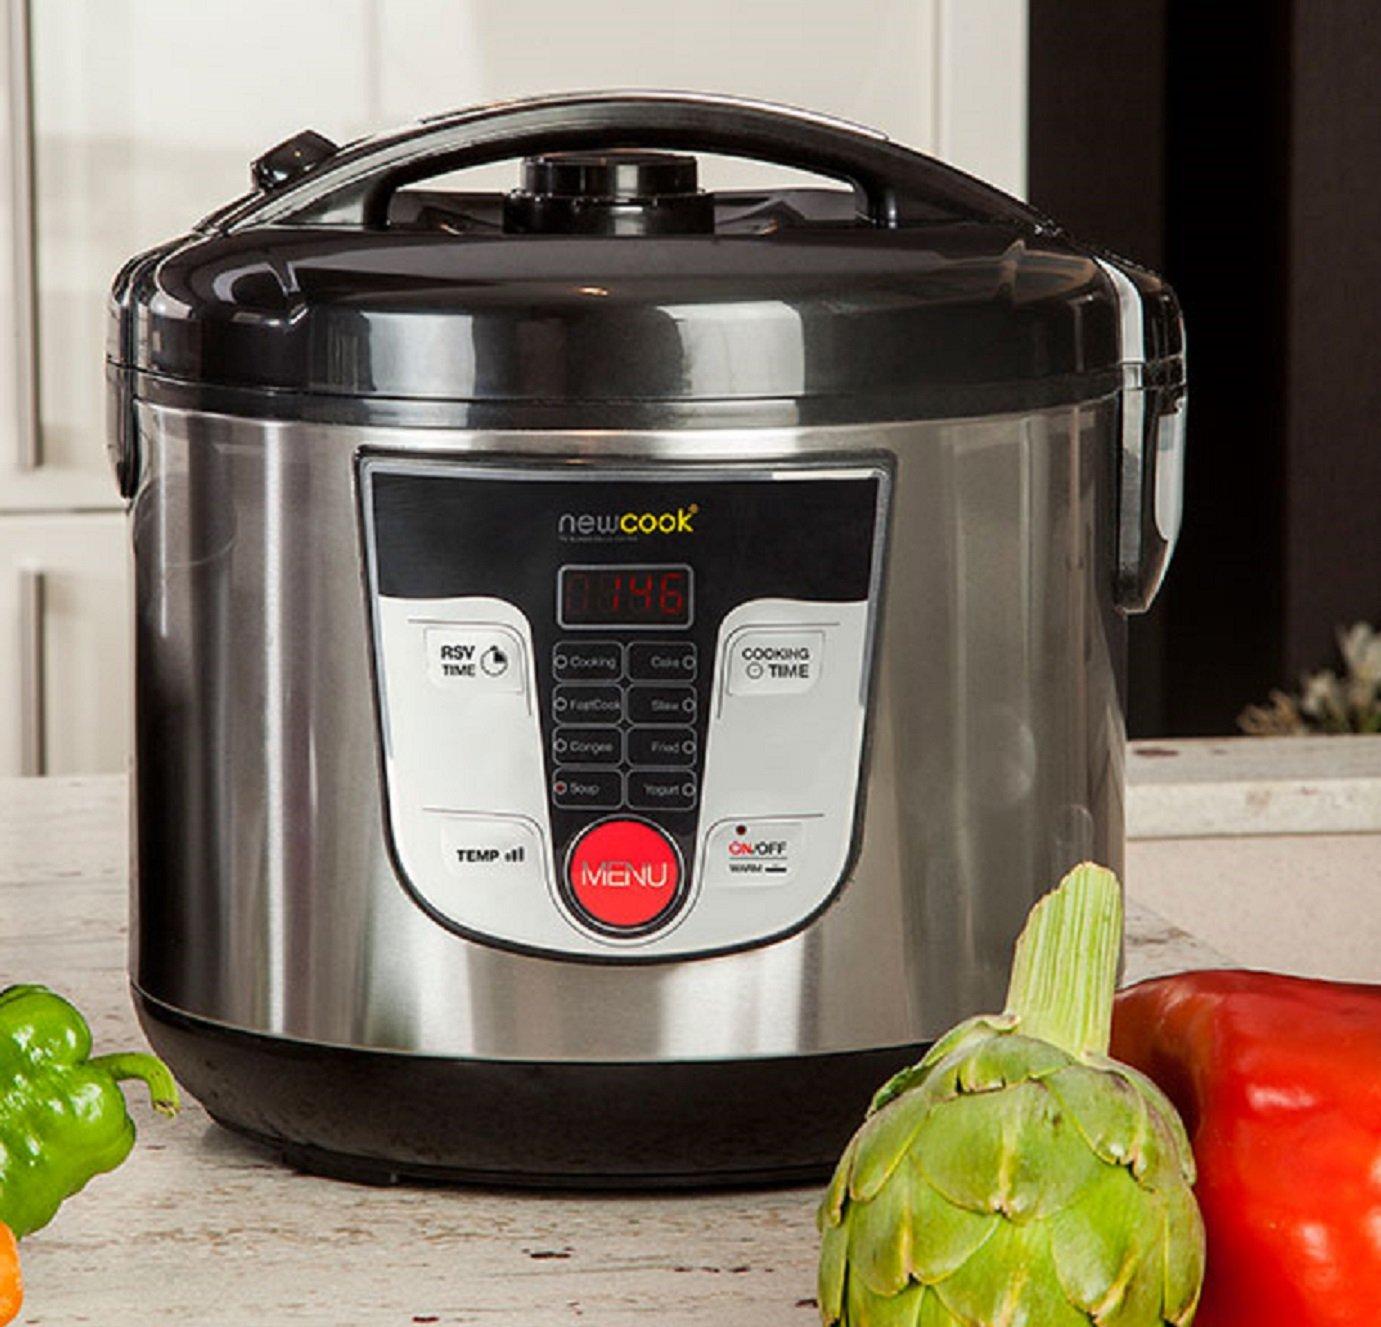 Top SHOP Newcook Robot de cocina 5 Lt de acero inoxidable 29 x 29 x 29 cm 700 W Negro KK1: Amazon.es: Hogar